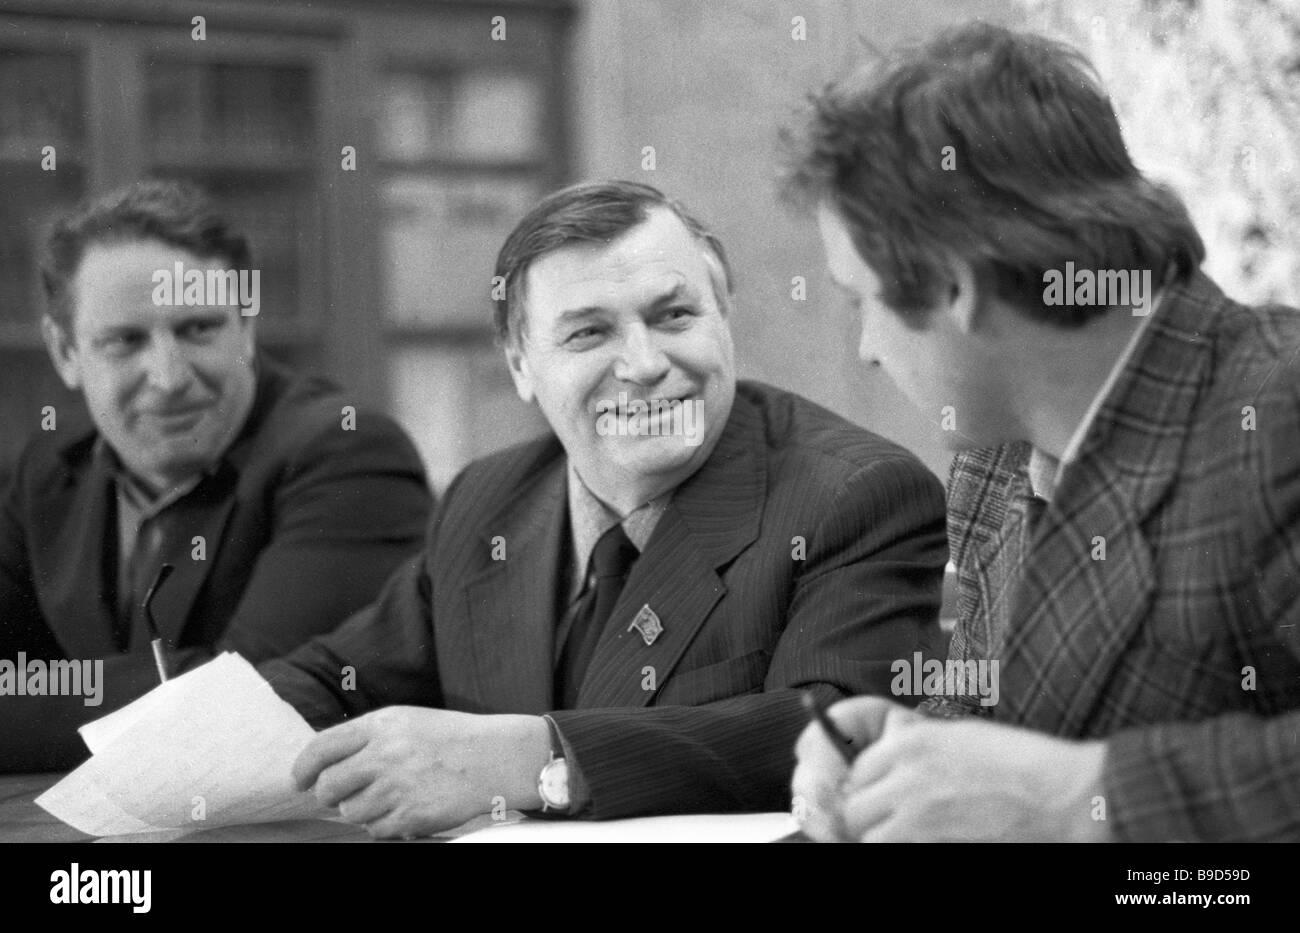 Writer mikhail alexeyev moskva magazine editor center with his fellow villagers of monastyrskoye saratov region